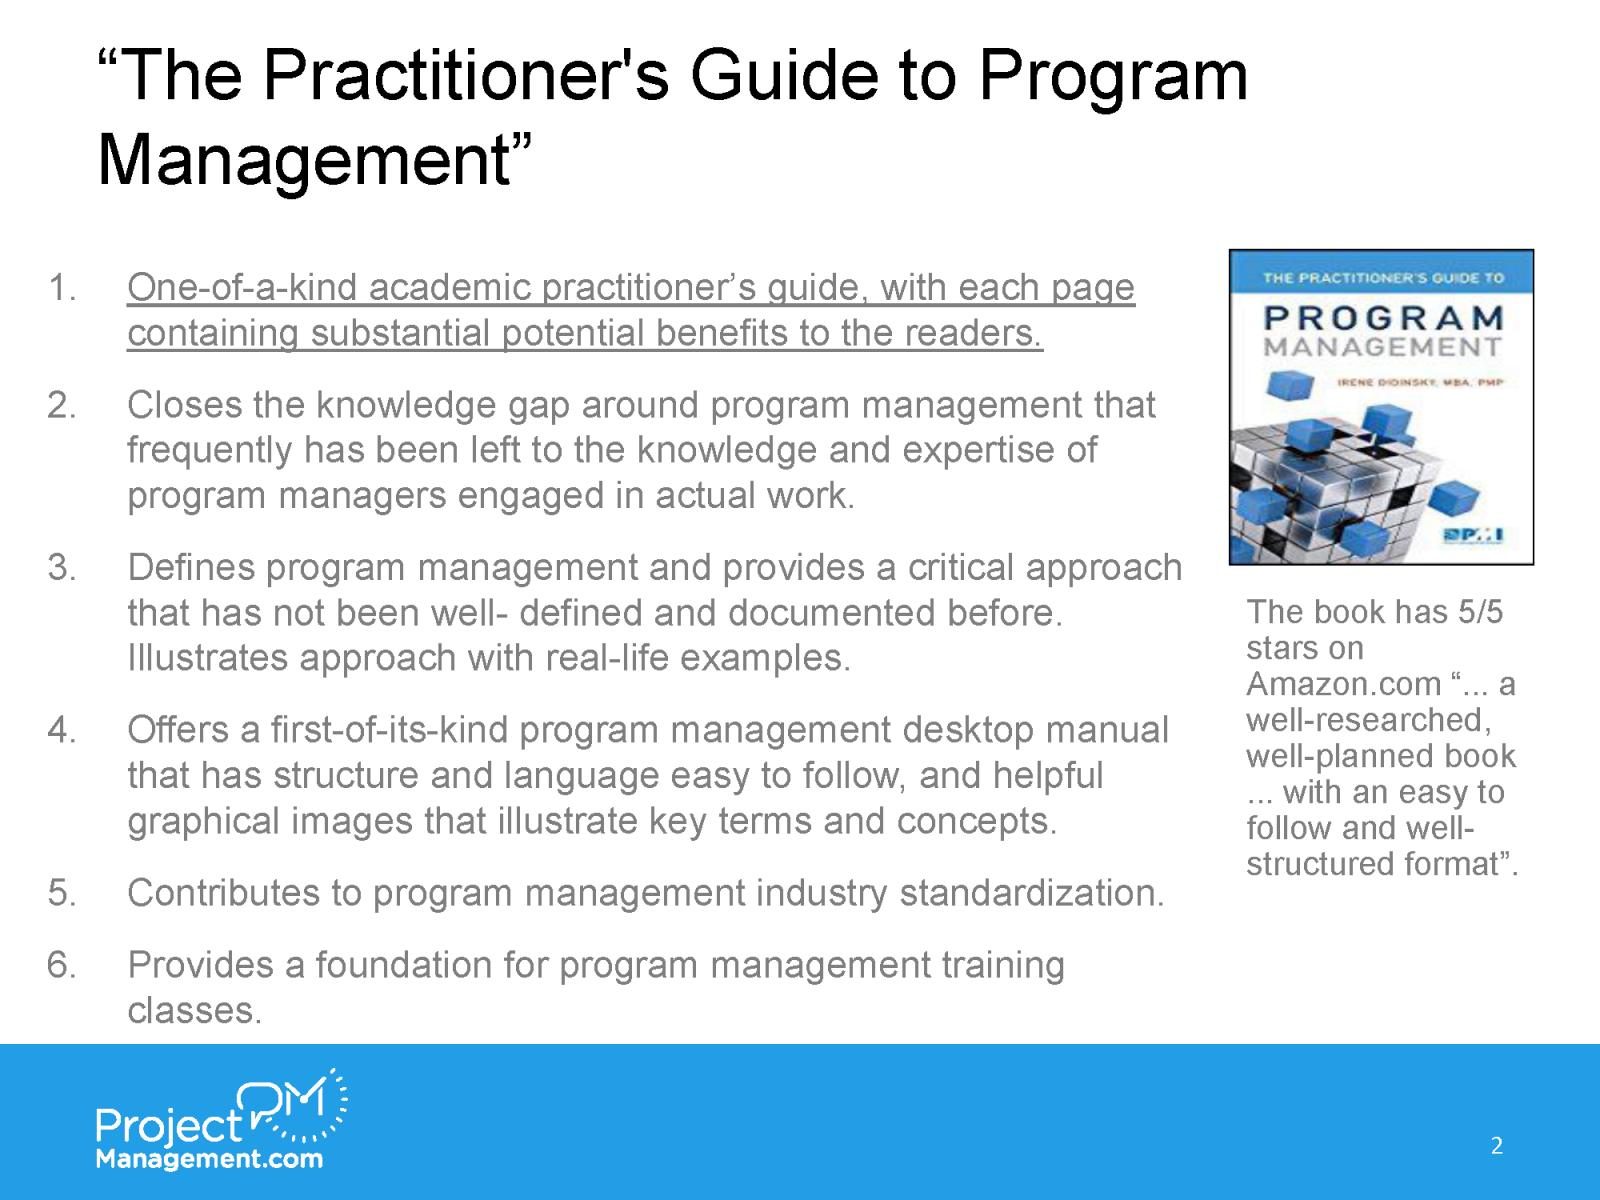 ProjectManagementcom webinar_Irene Didinsky_03282018_v01 (1)_Page_02